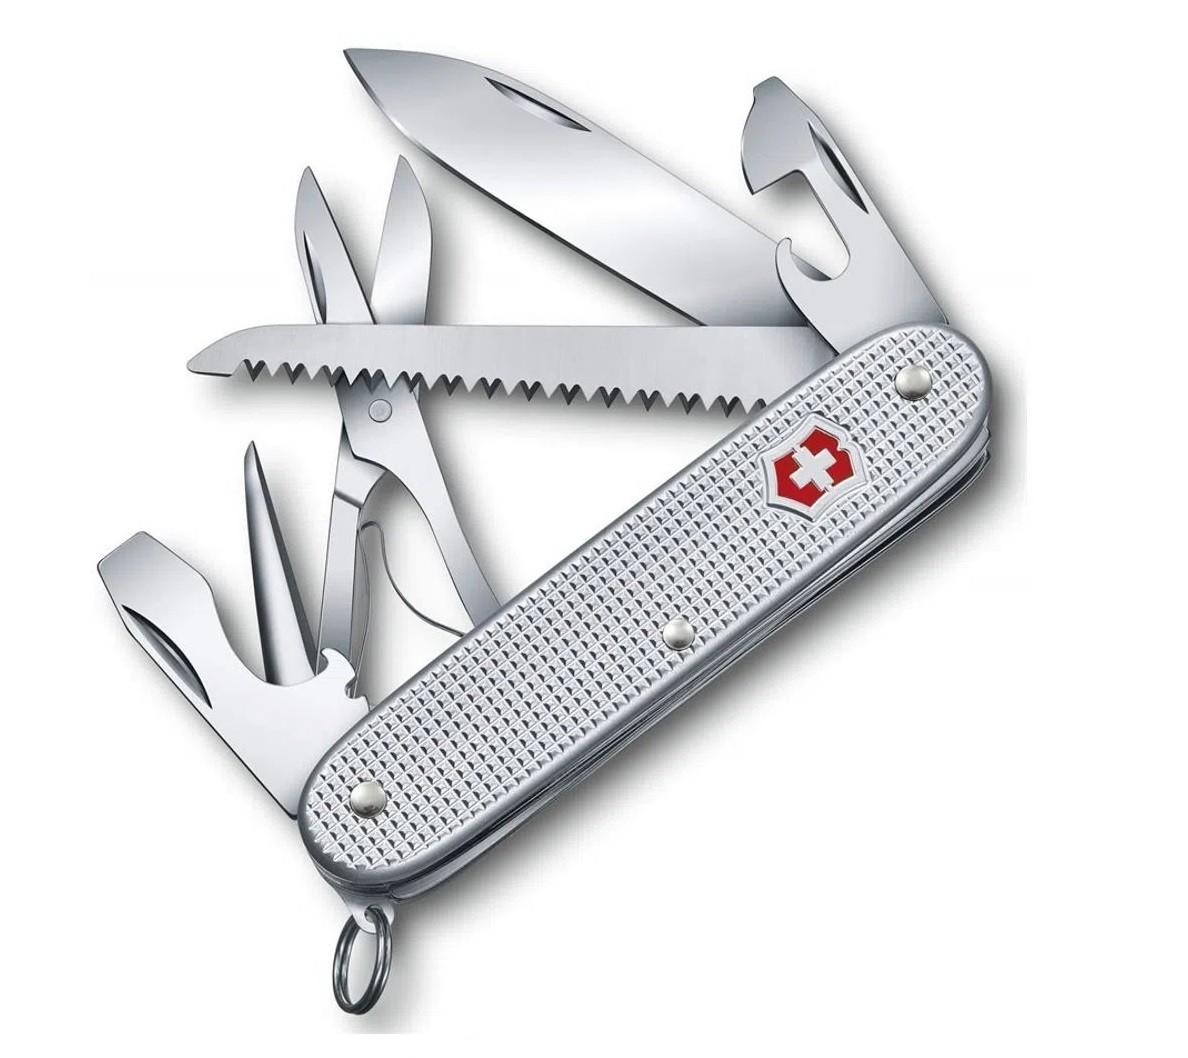 Canivete Suíço Farmer X Alox Silver Victorinox 10 funções 0.8271.26  - Mix Eletro